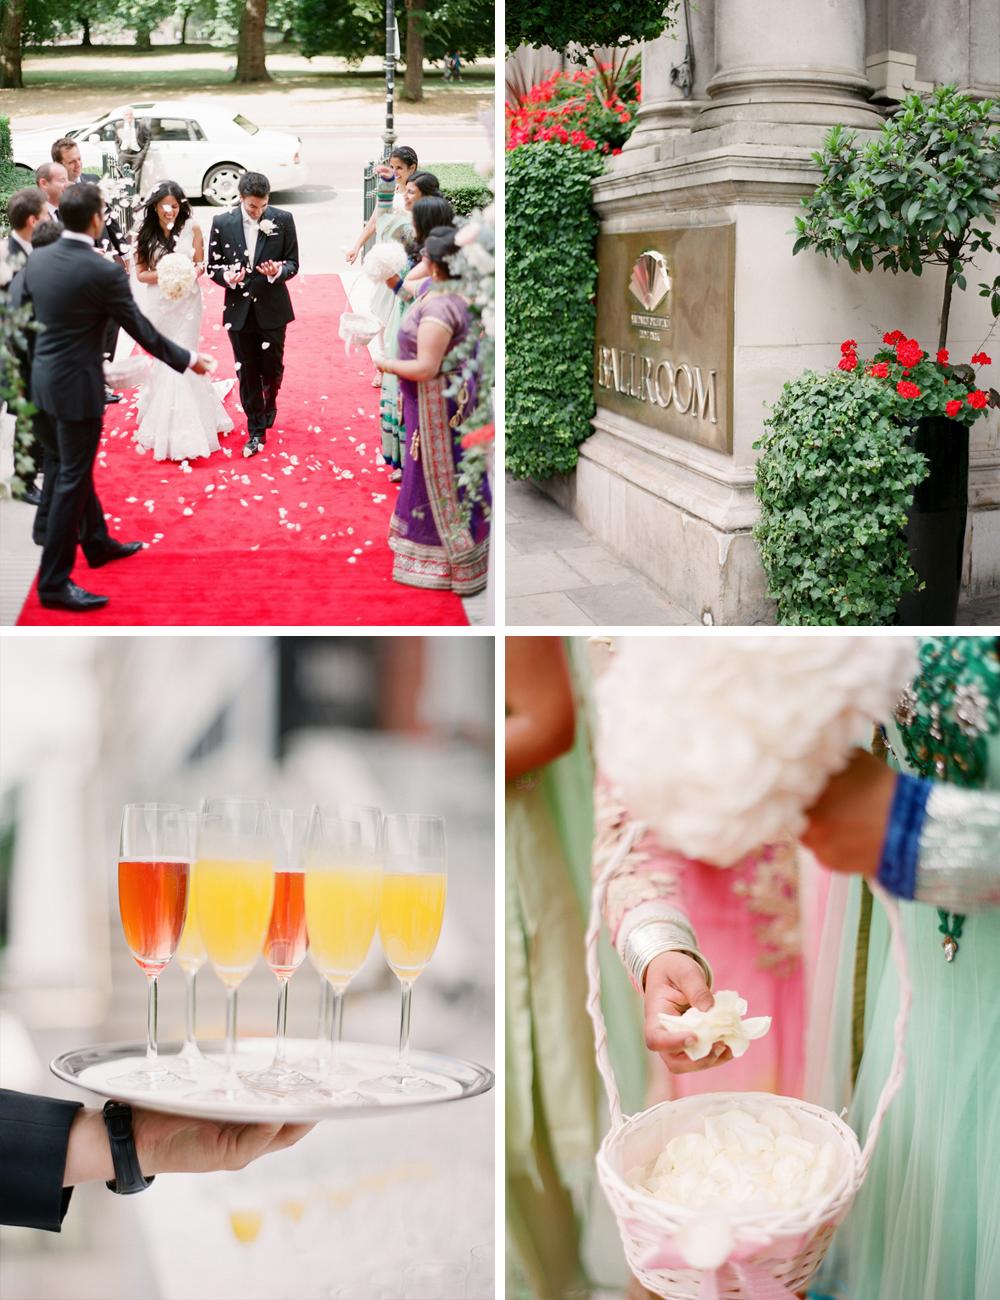 Jewish Hindu multi cultural wedding at the Mandarin Oriental London 3